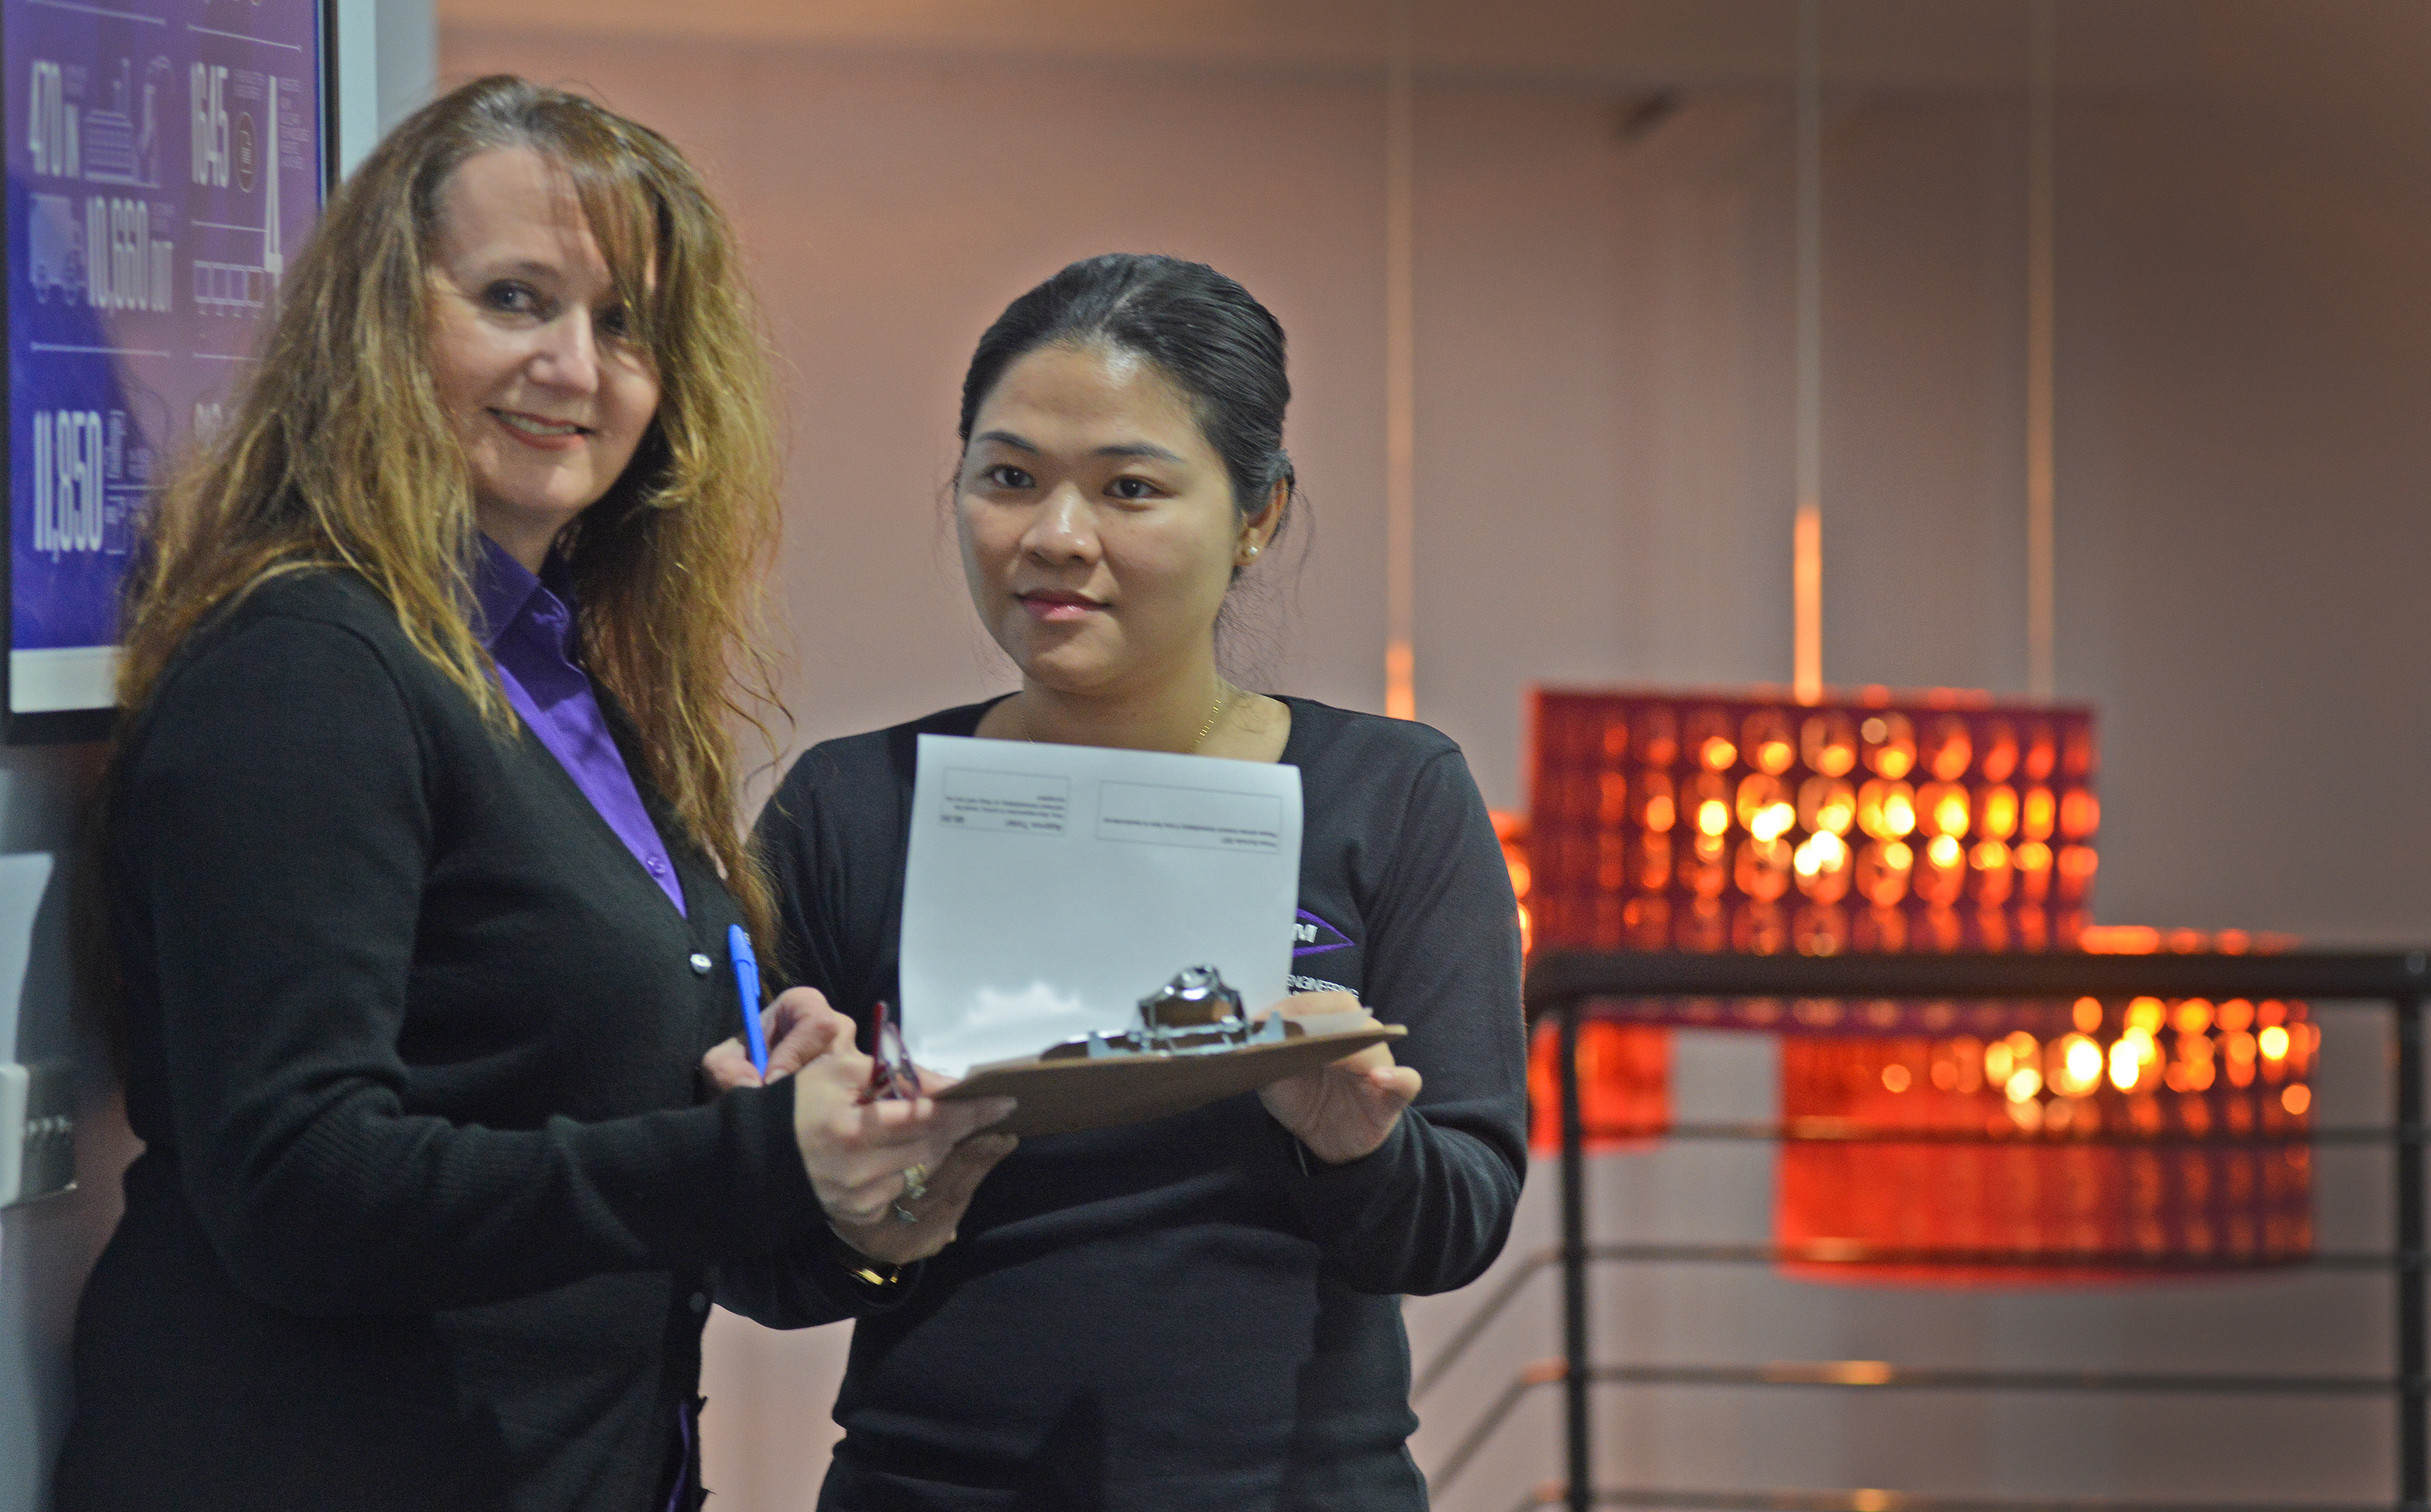 Freda Efstathiou and Lori Zhang